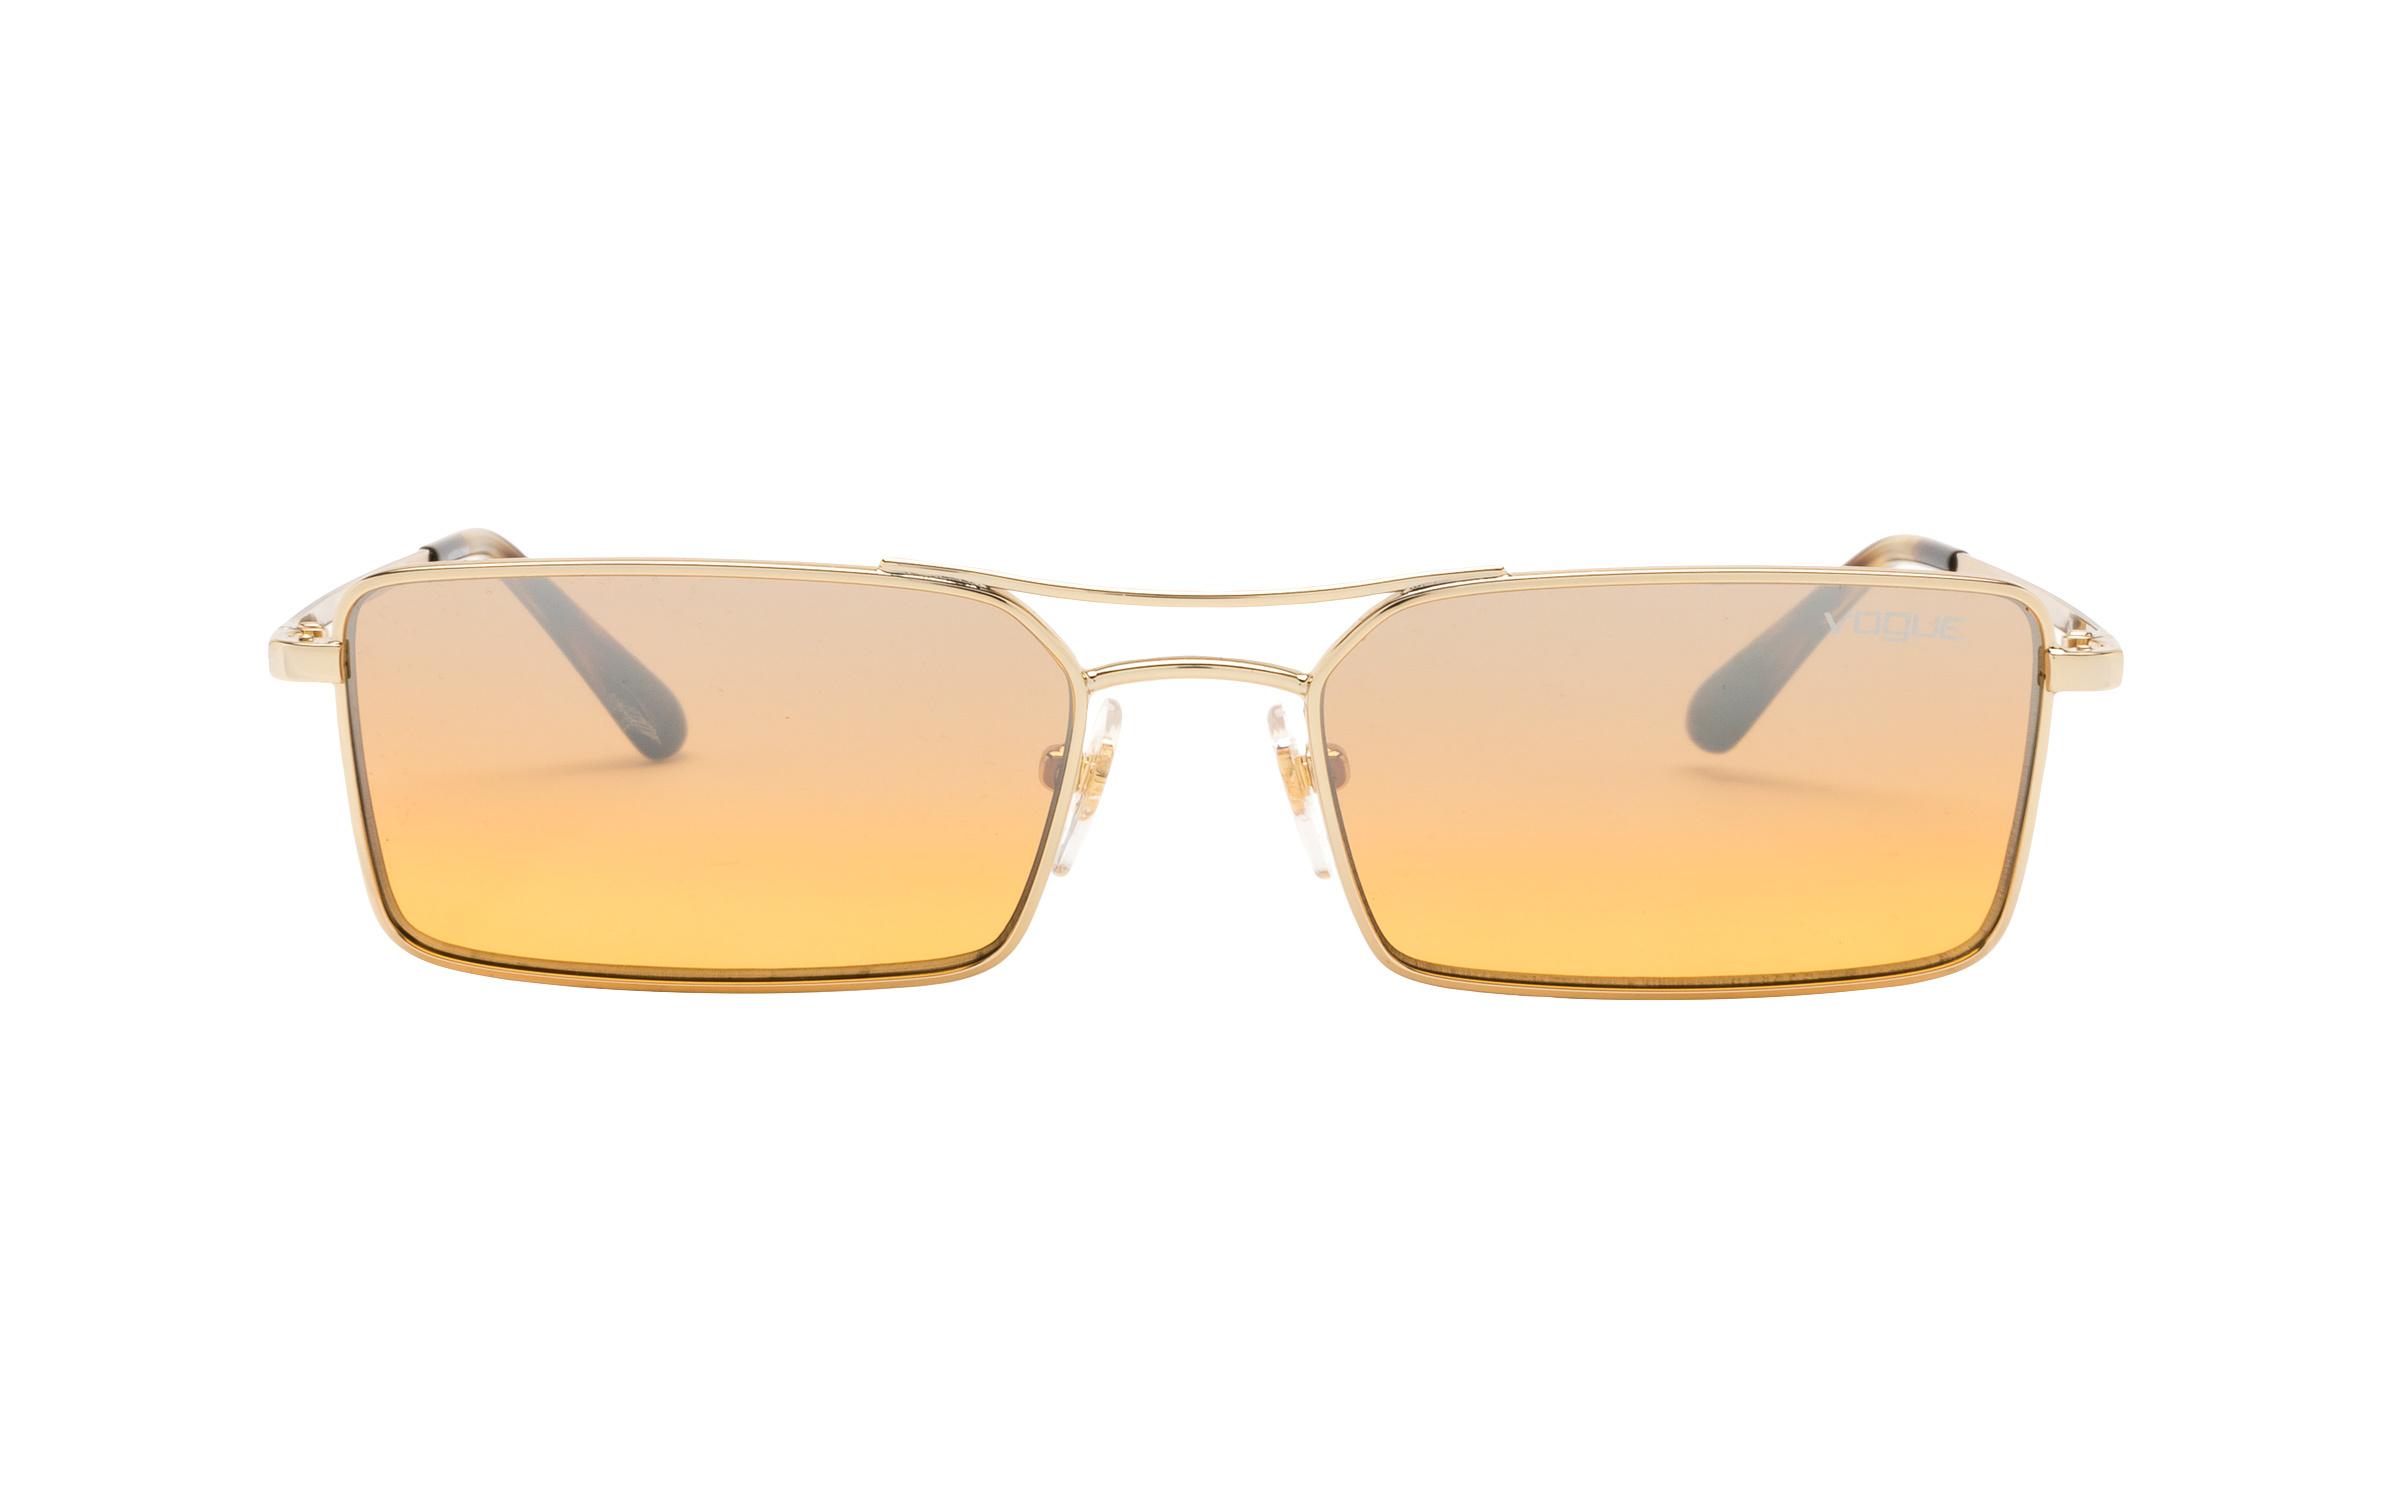 http://www.coastal.com/ - Luxottica Vogue VO4106-S 848/7H 55 Sunglasses in Pale Gold | Plastic/Metal – Online Coastal